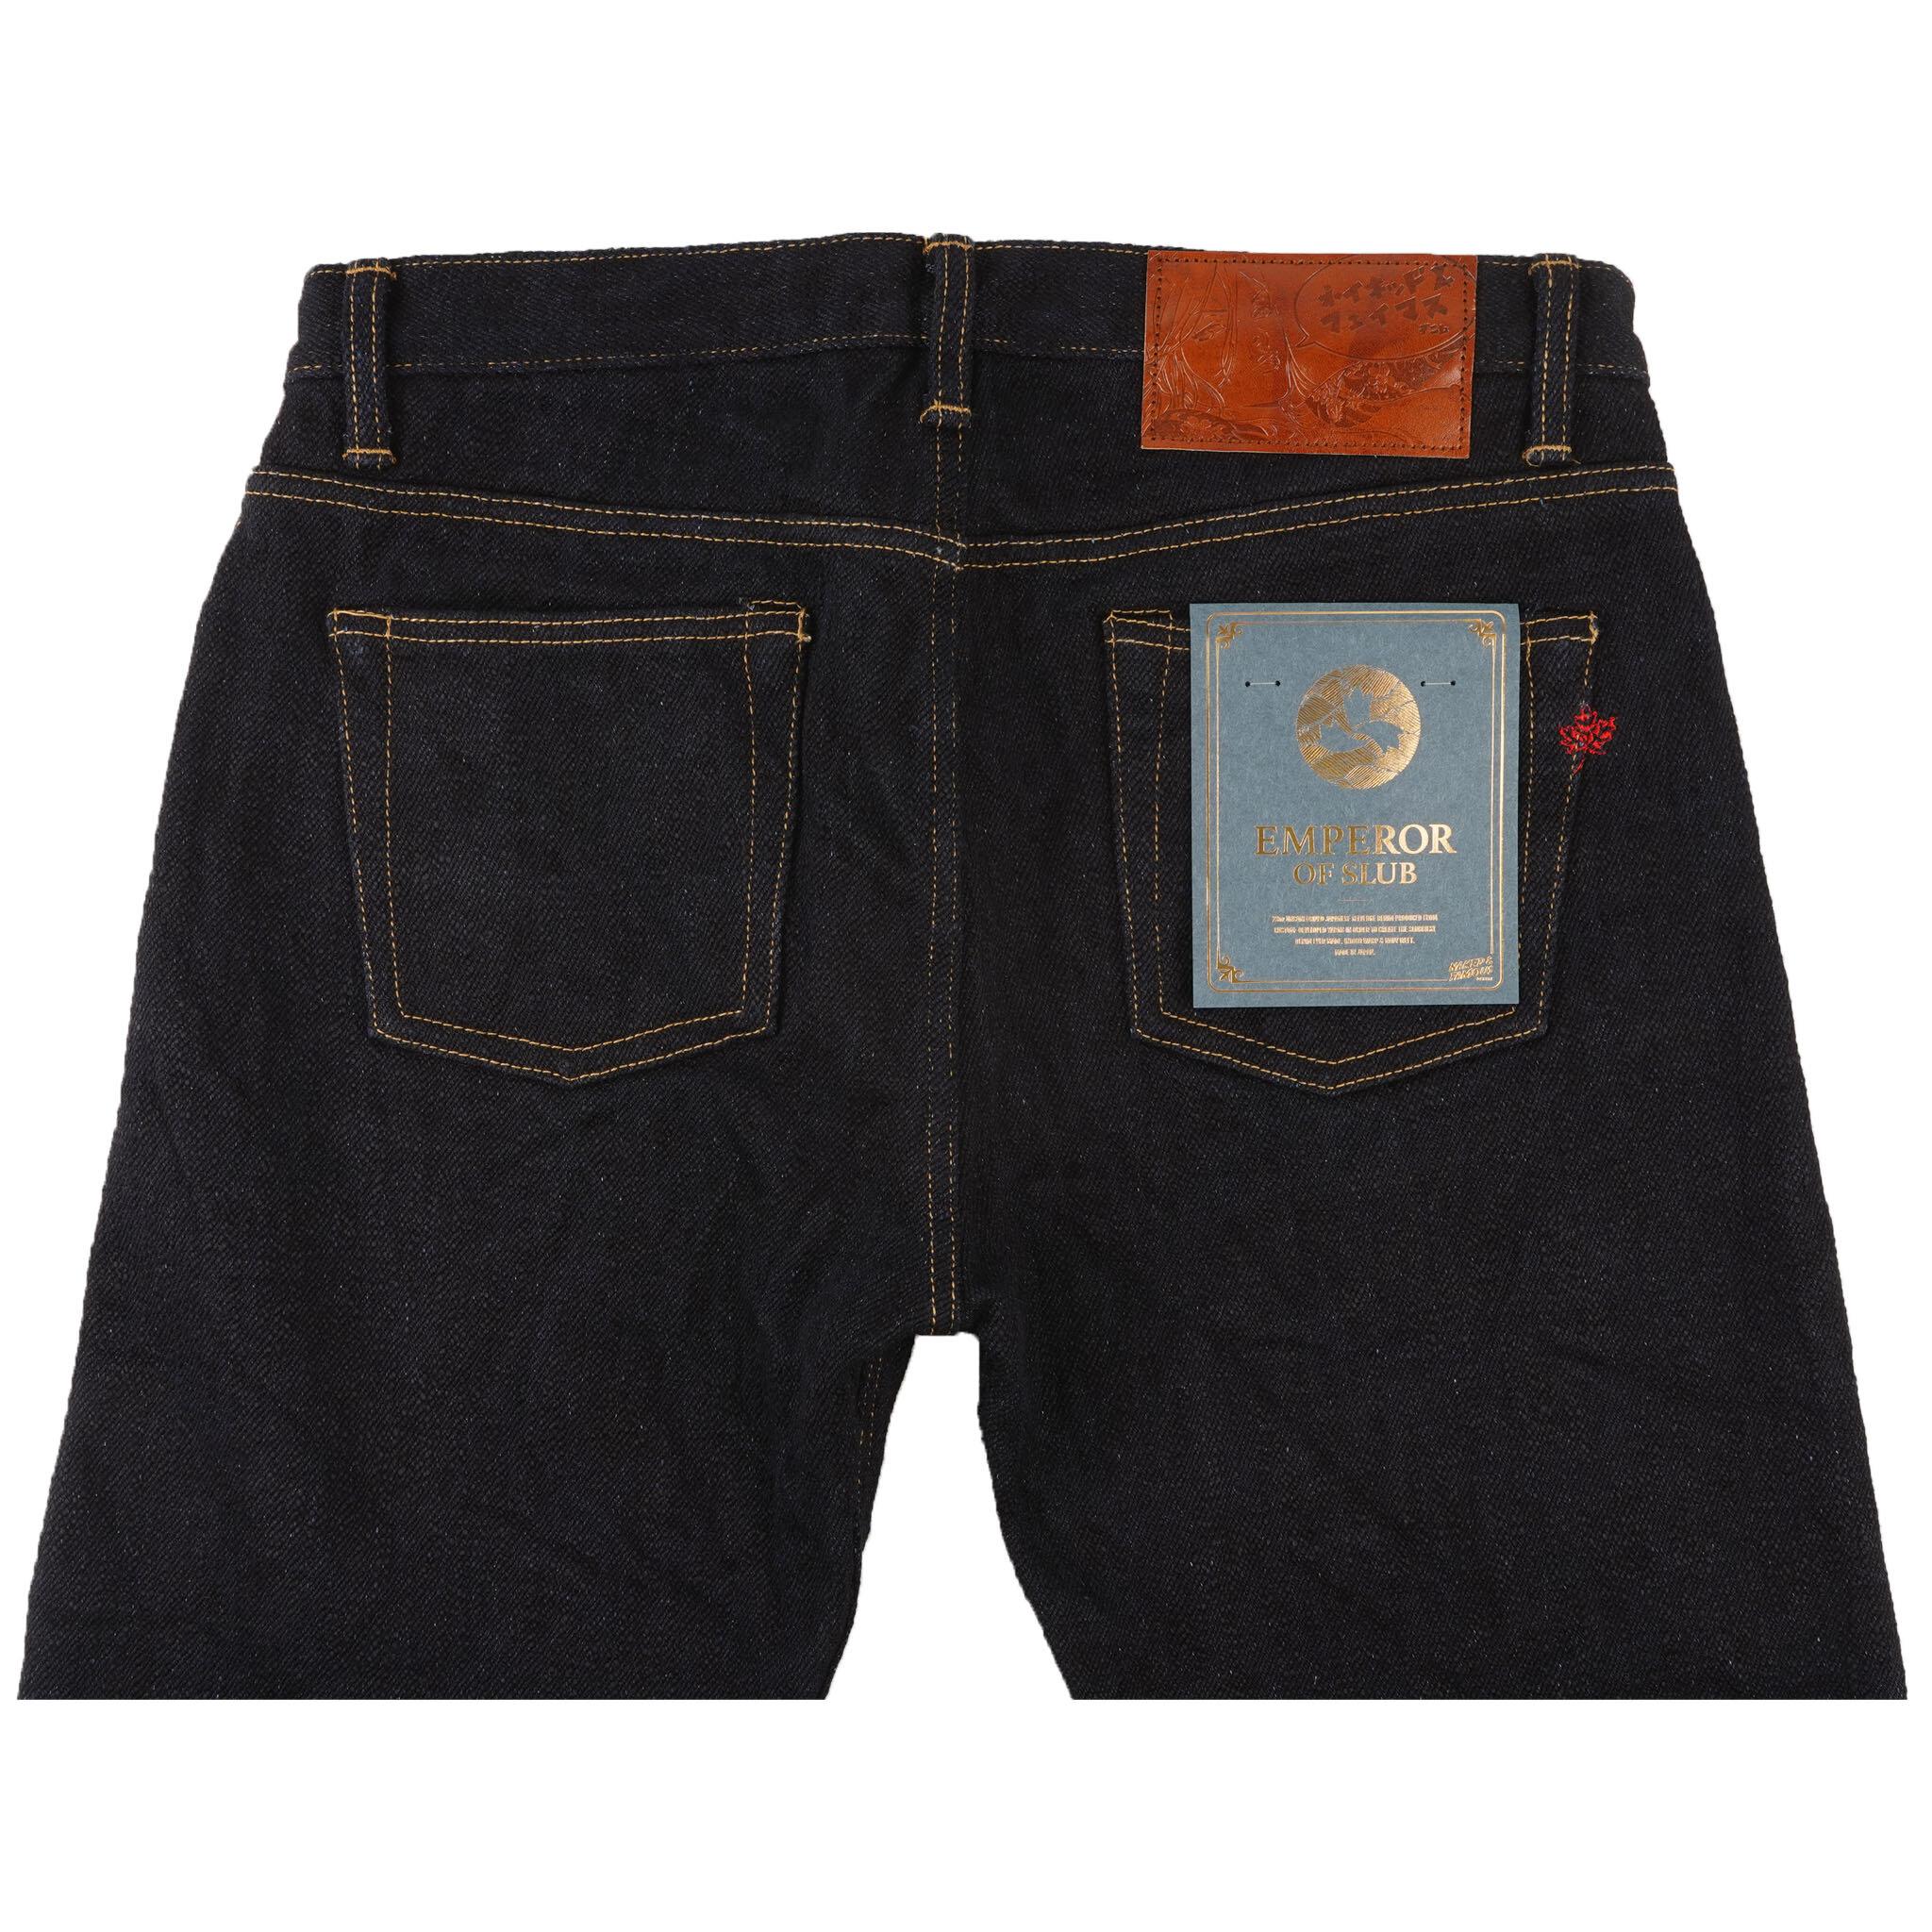 Emperor of Slub Grand Blue Jeans - back